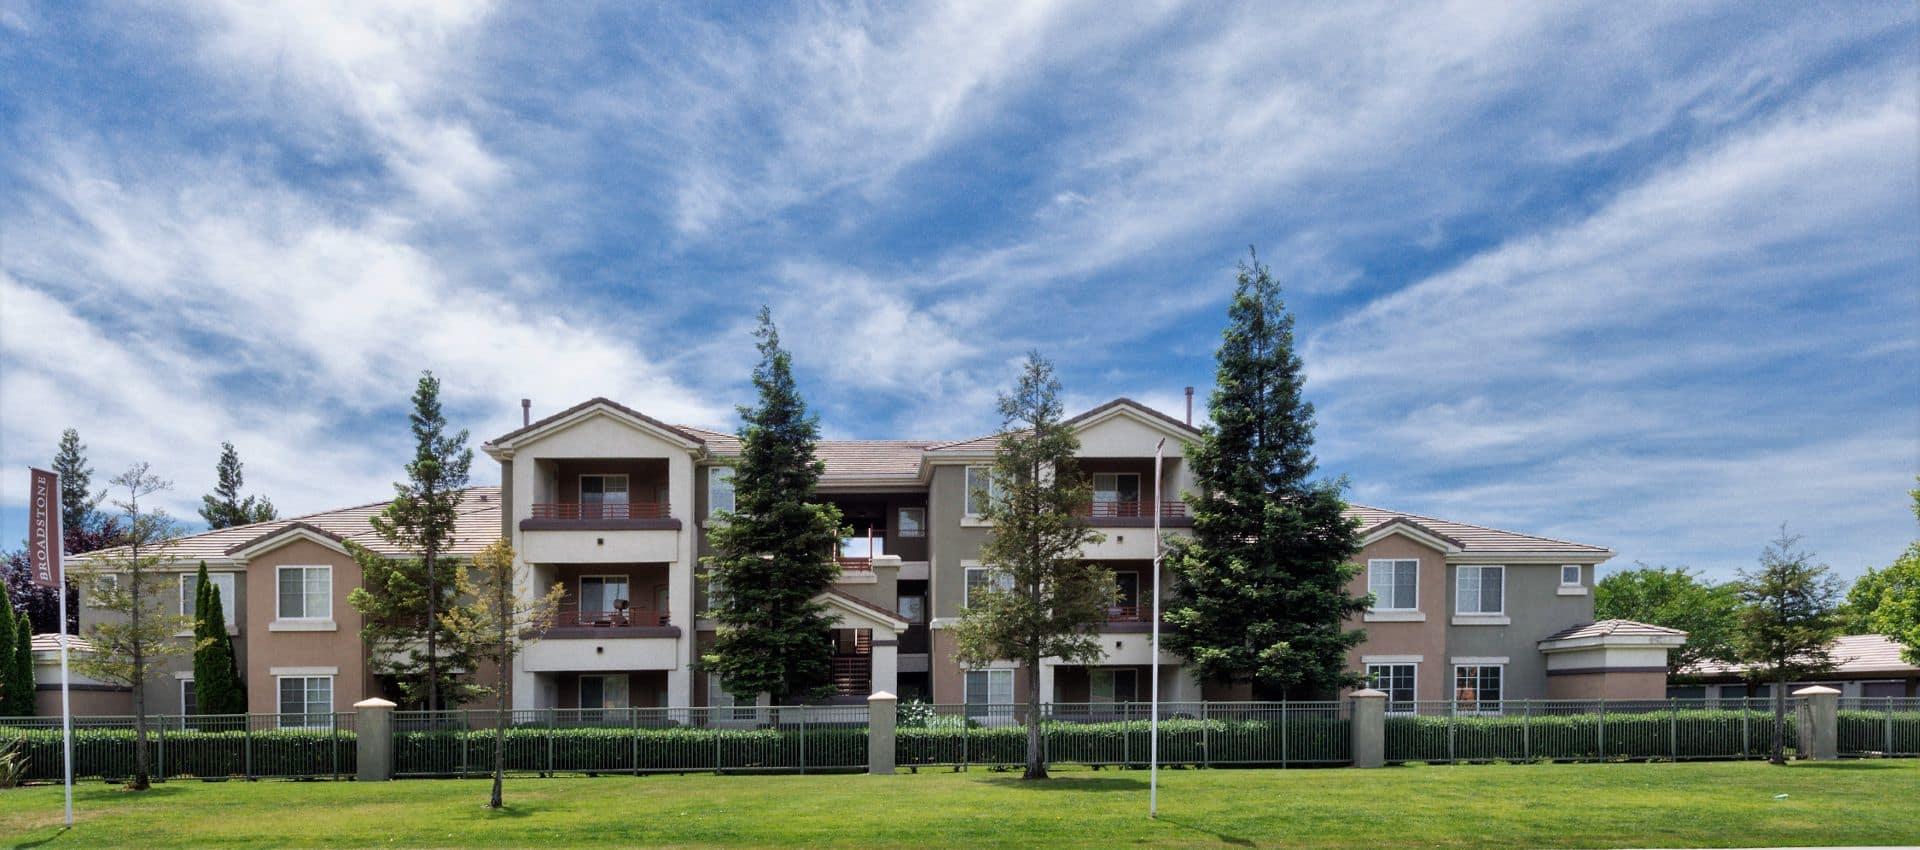 The Artisan Apartment Homes's Exterior View in Sacramento, CA